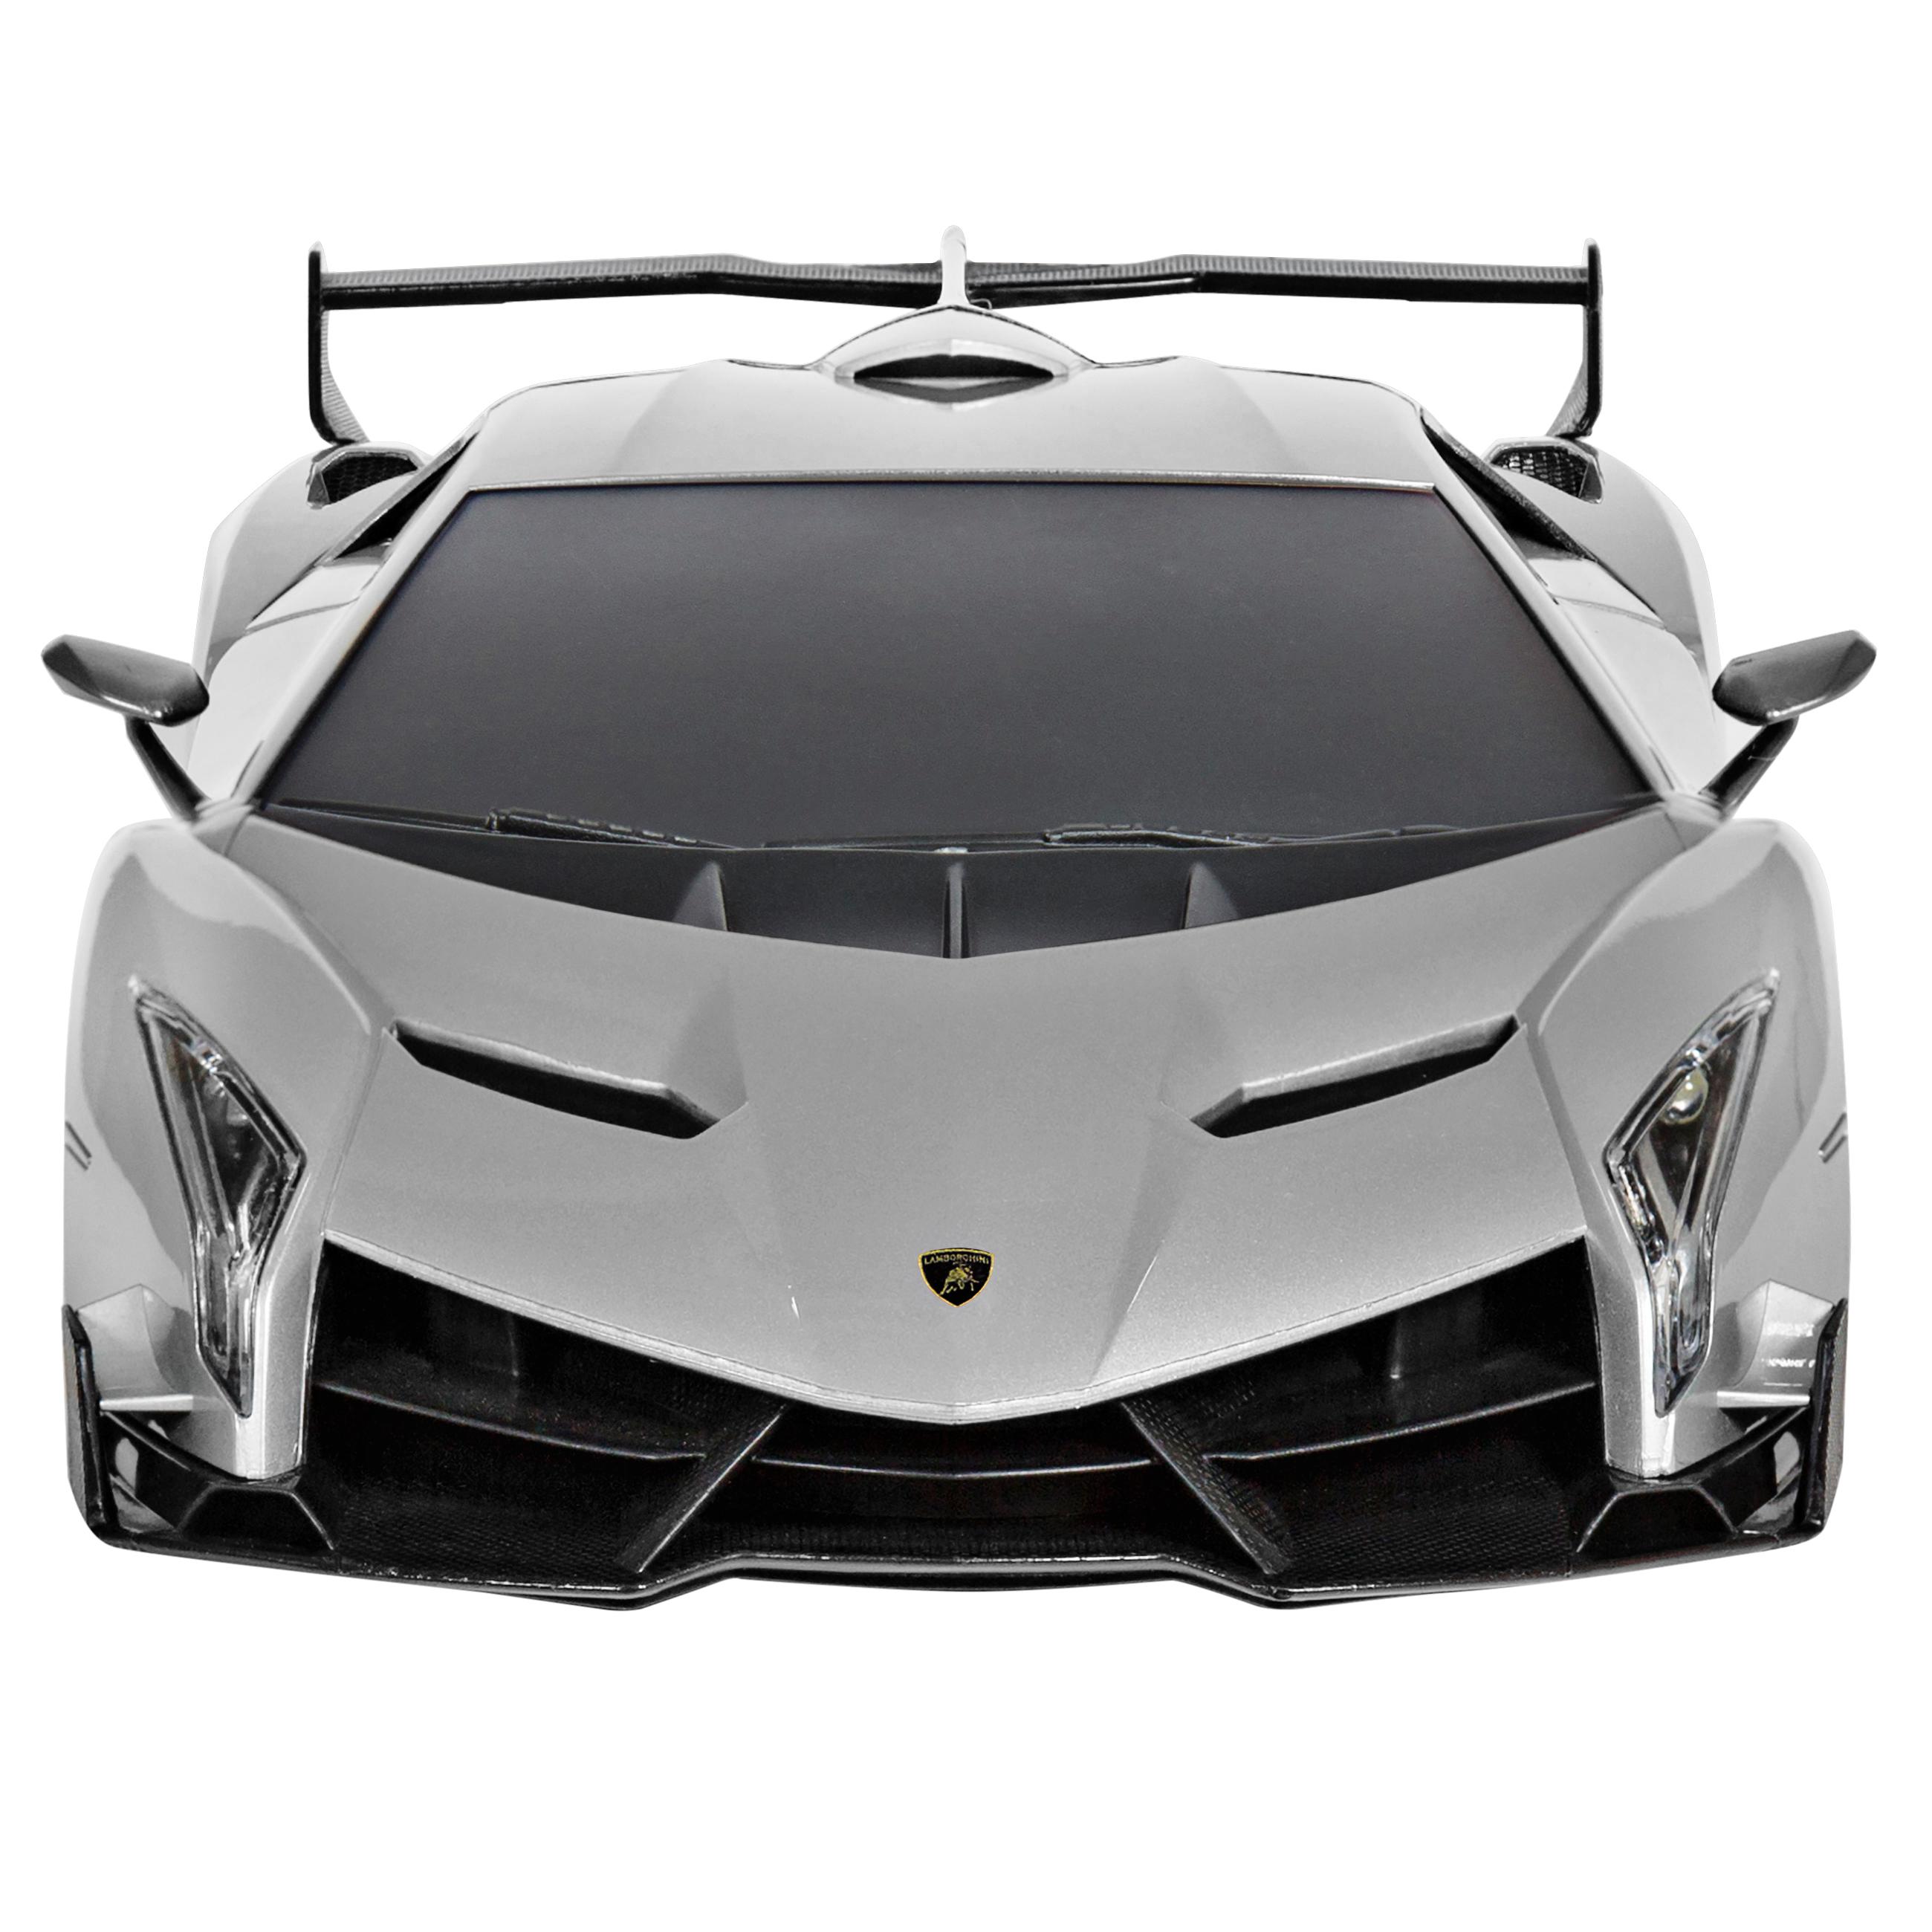 BCP-1-24-Kids-RC-Lamborghini-Veneno-Racing-Car-Toy-w-Lights-Shock-Suspension thumbnail 26